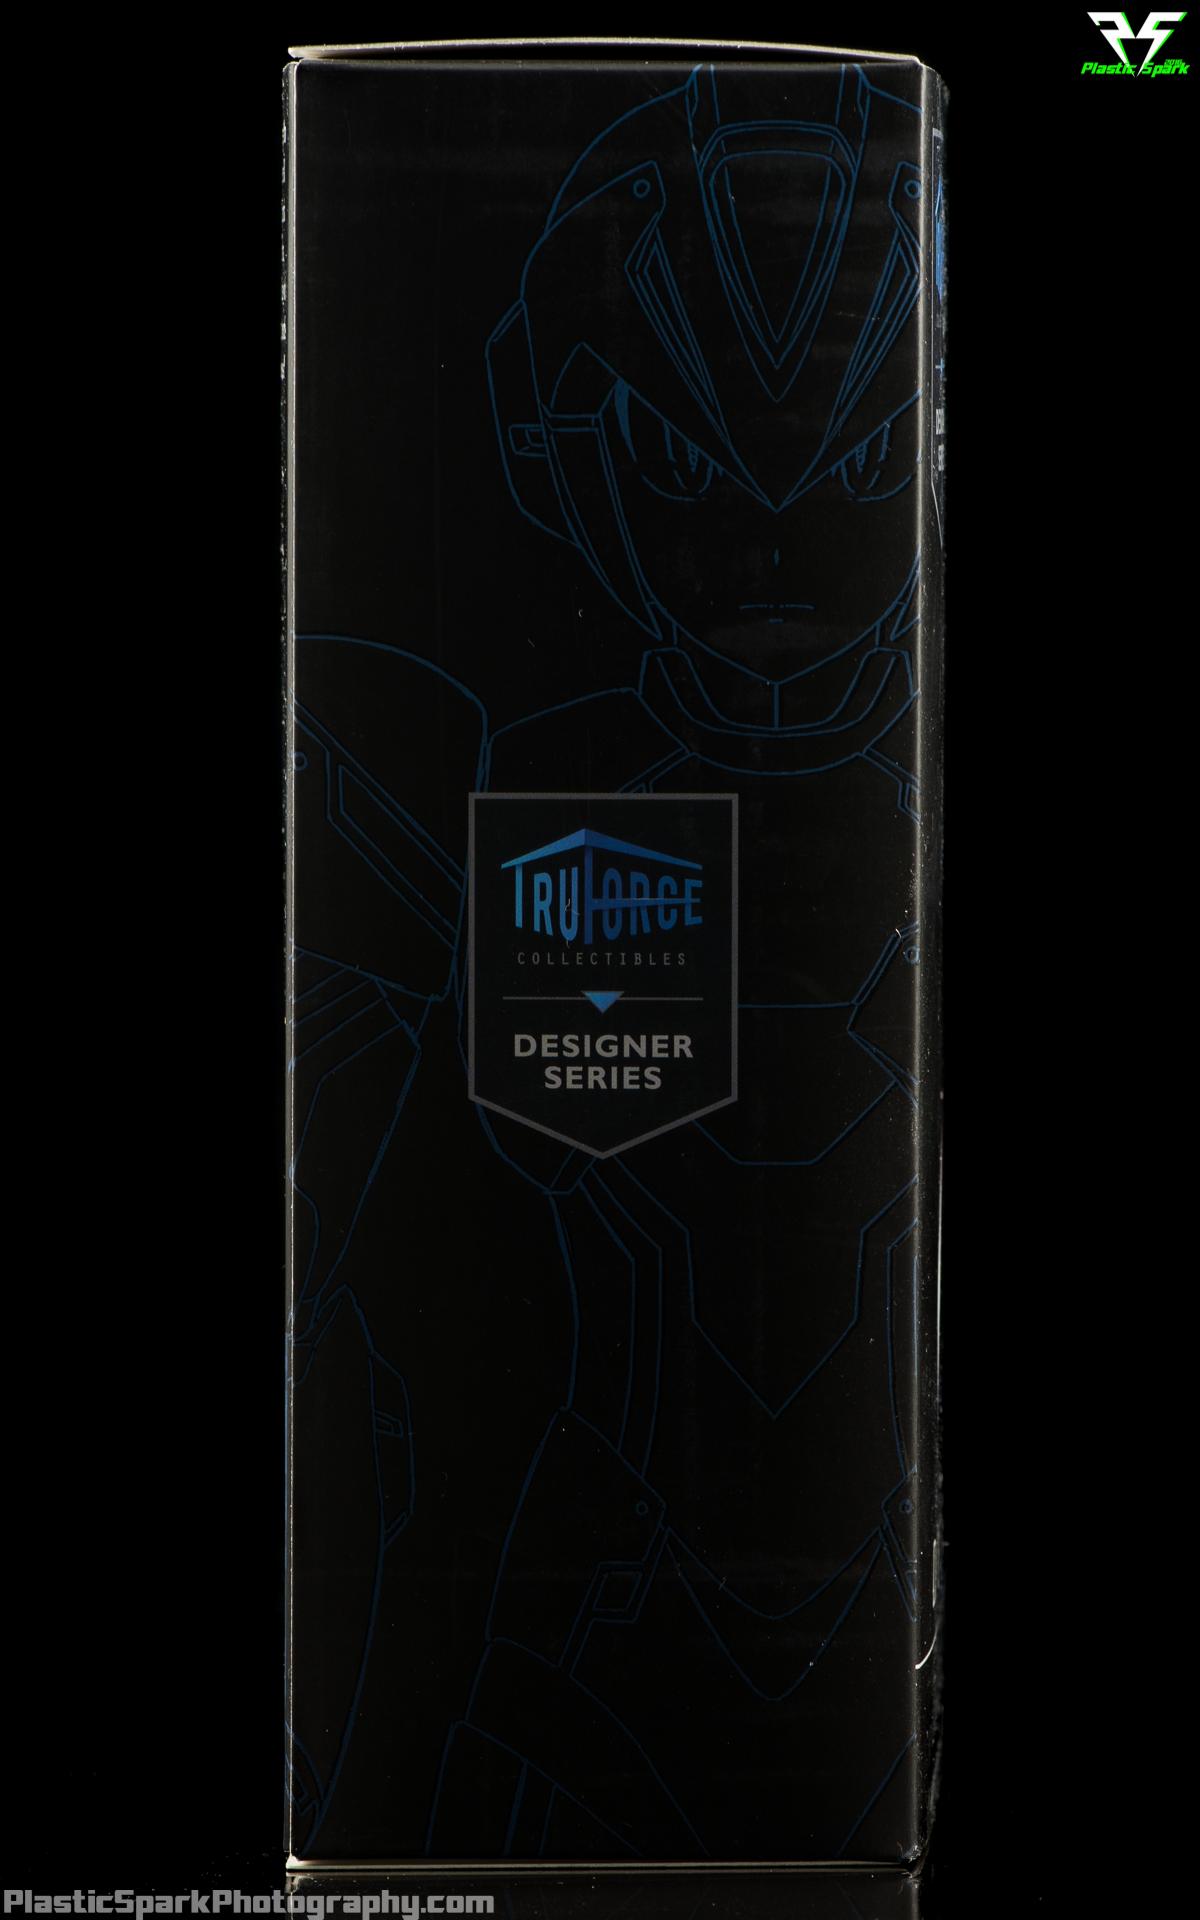 Truforce-Megaman-X-Packaging-(3-of-6).png